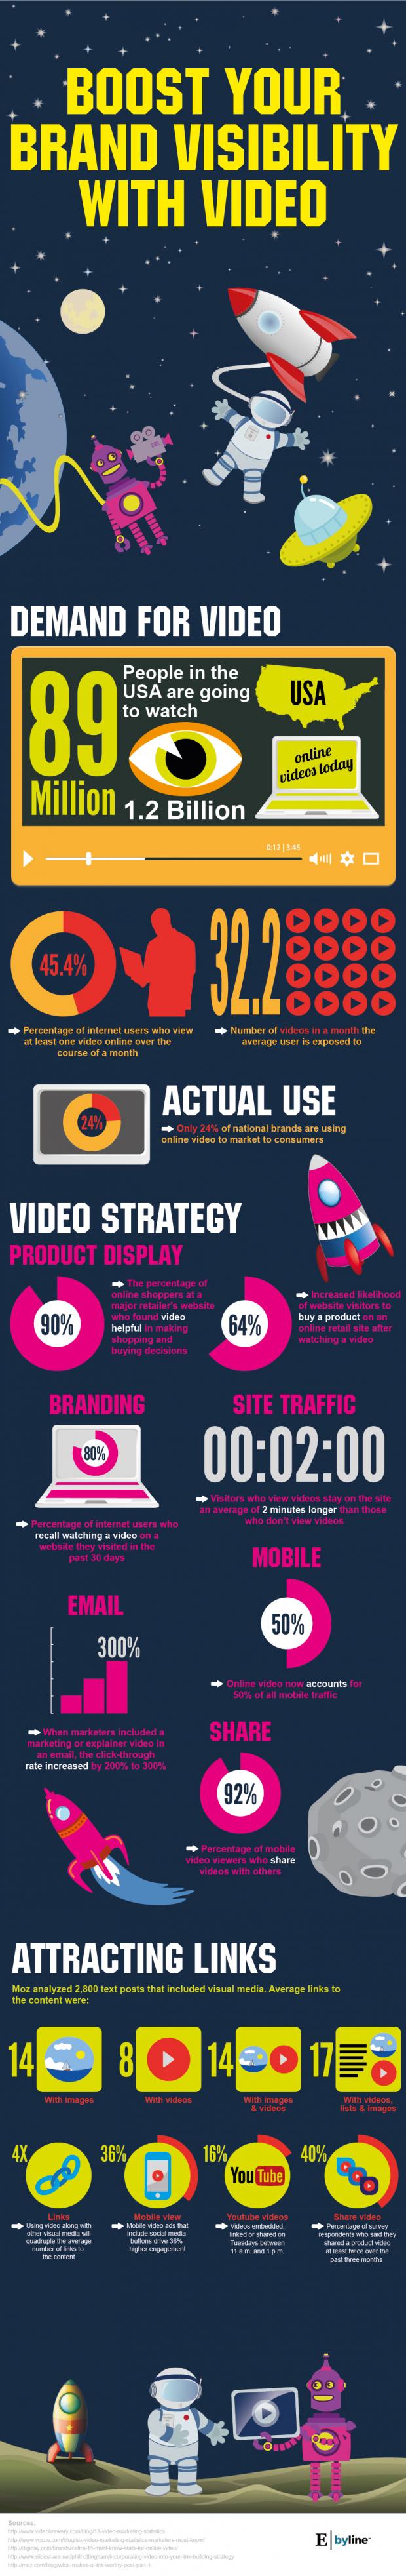 Infographic-2.1-video